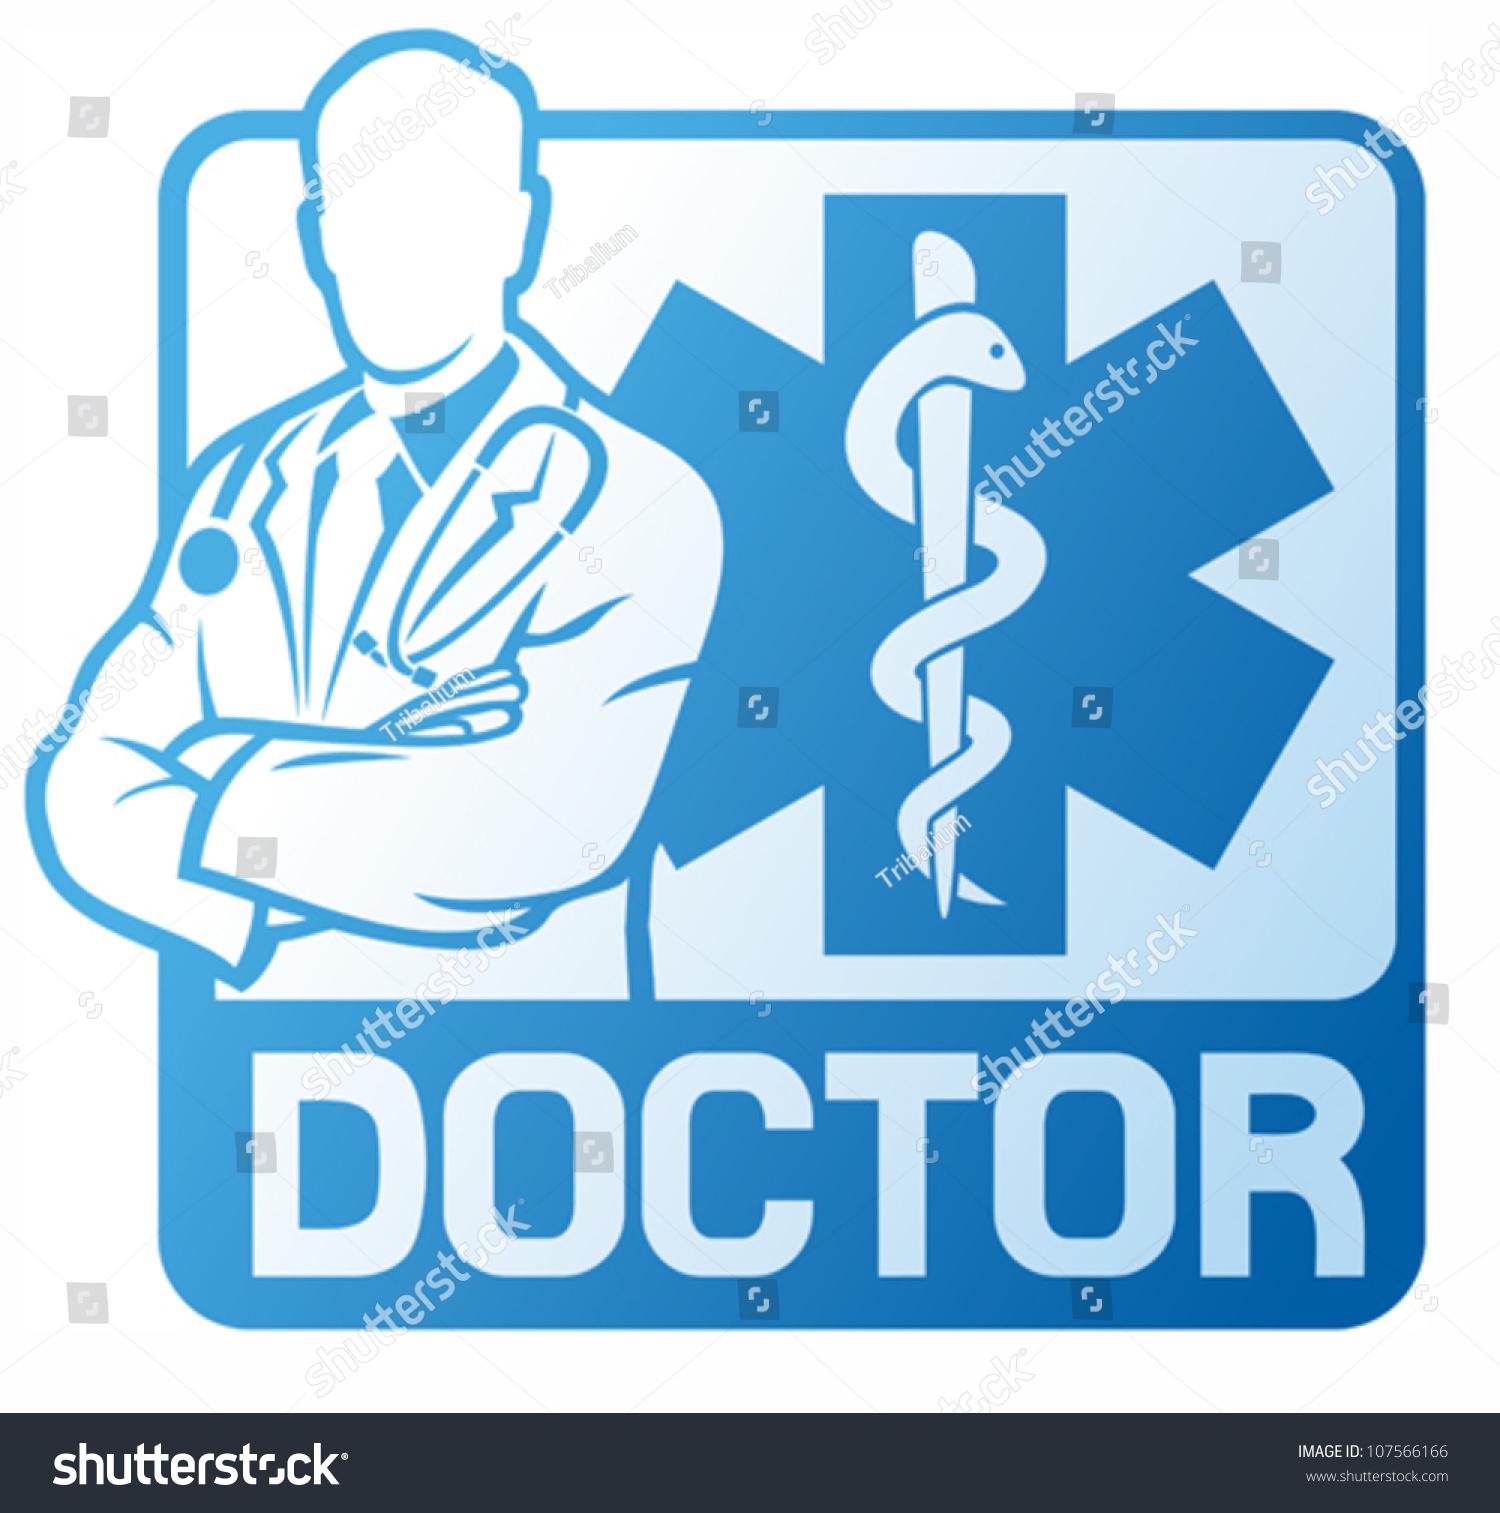 medical doctor caduceus snake stick sign stock vector Medical Logo Clip Art Cadeus Medical